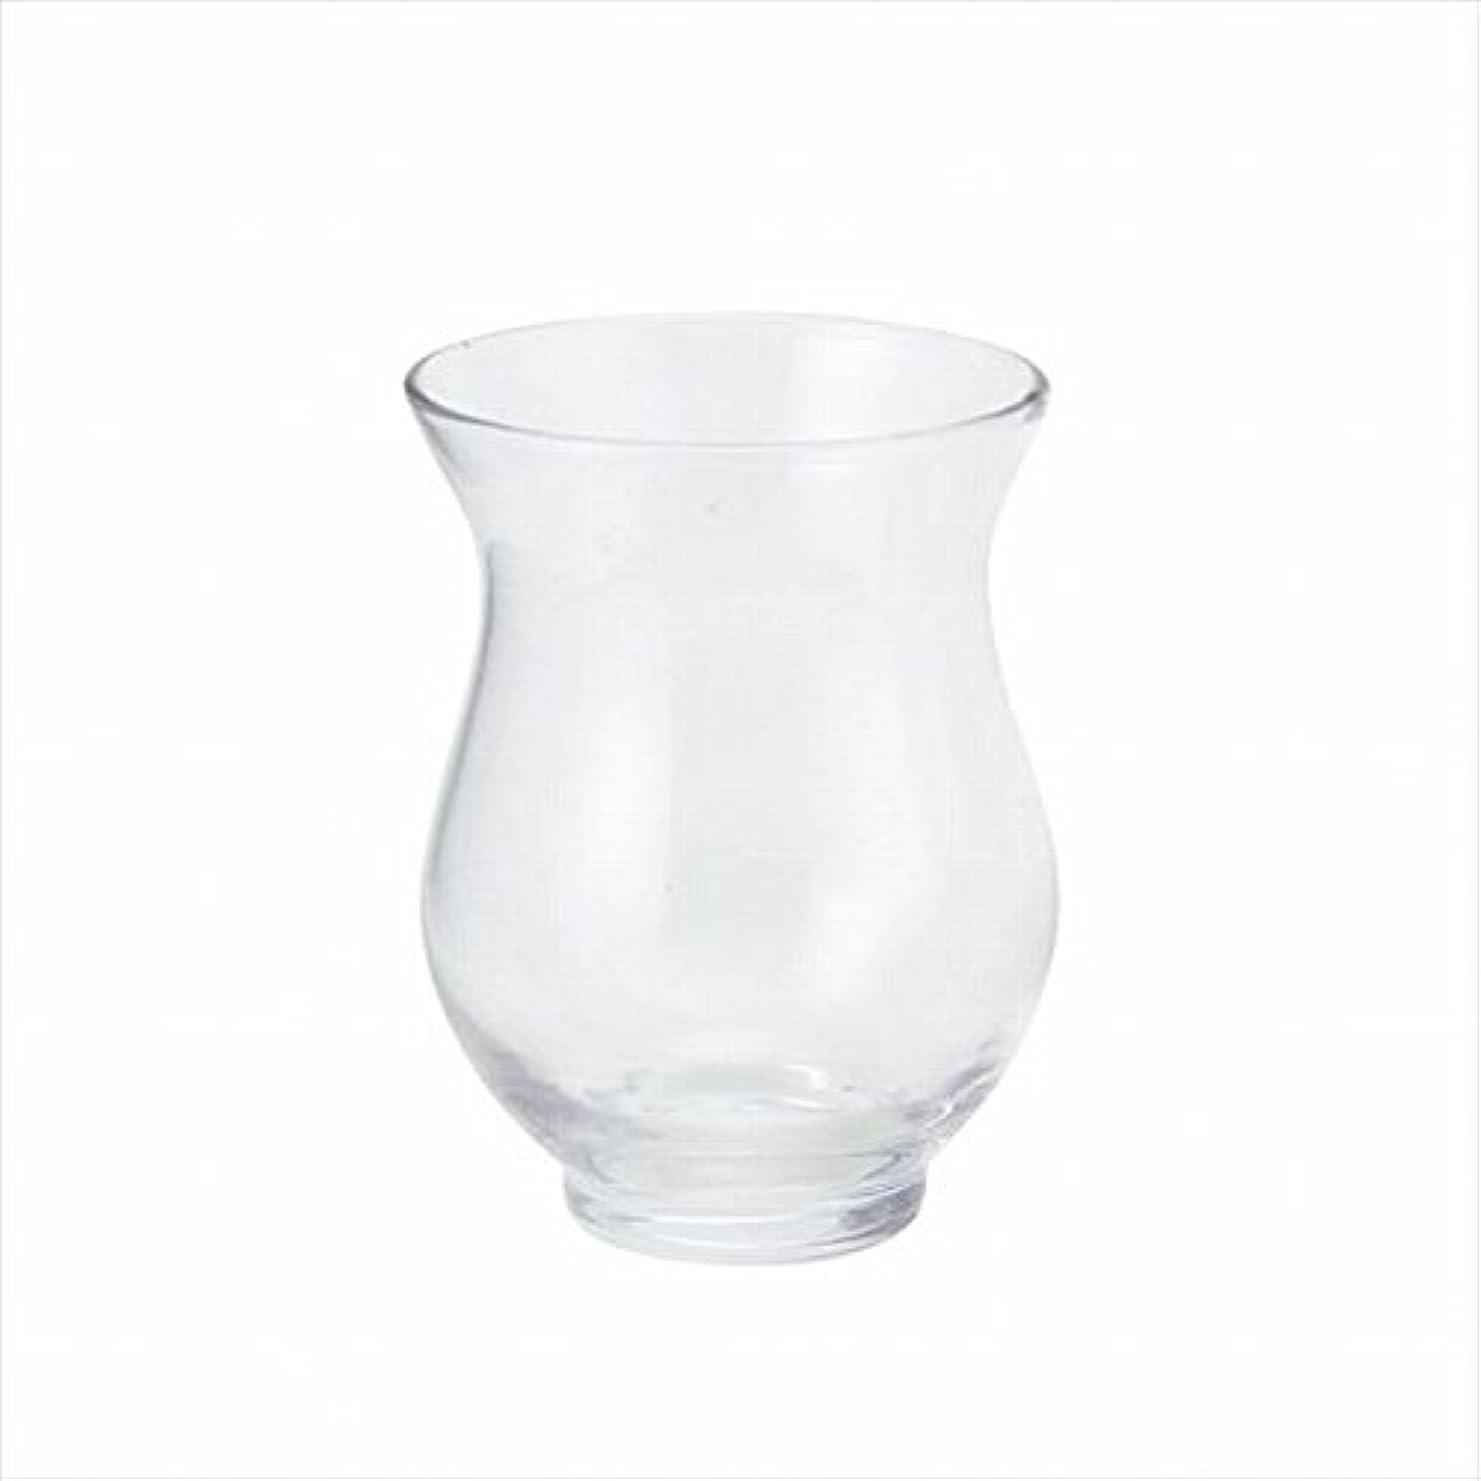 kameyama candle(カメヤマキャンドル) ウィンドライトエレガンスS キャンドル 75x75x100mm (D3825023)